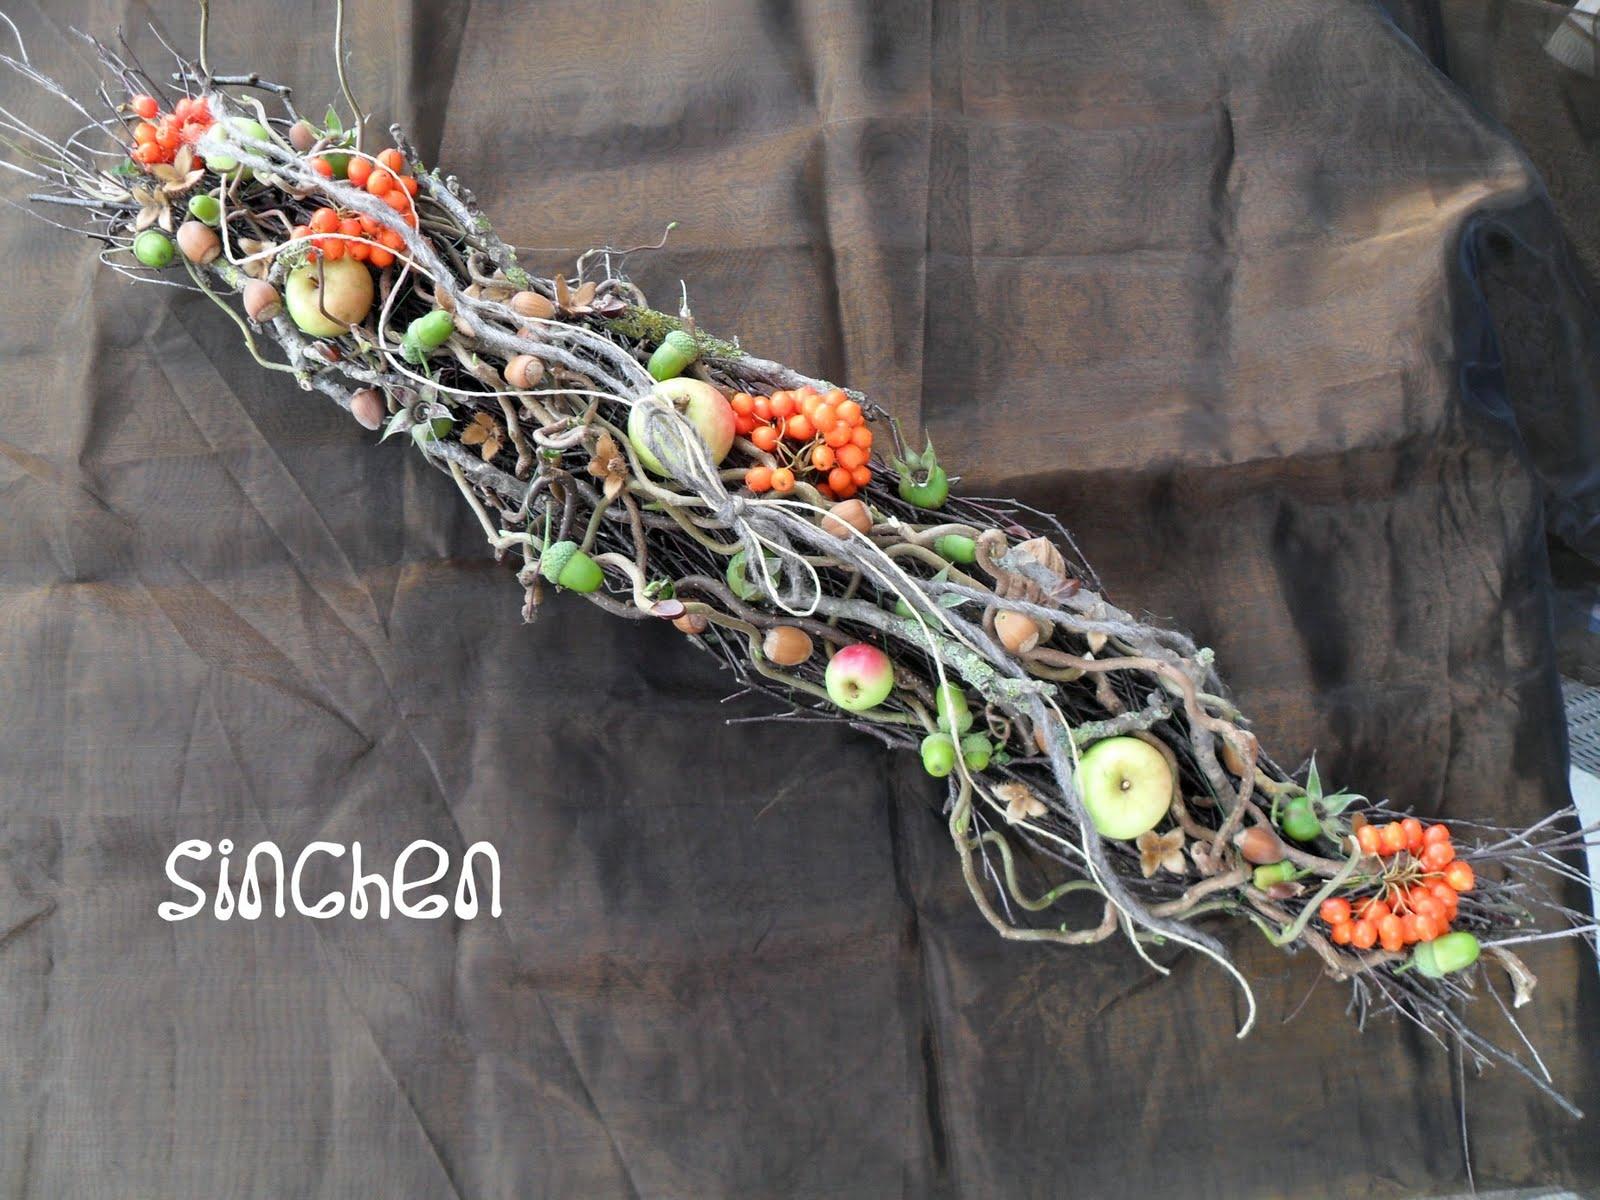 Sinchens roter Faden: Herbstbasteln